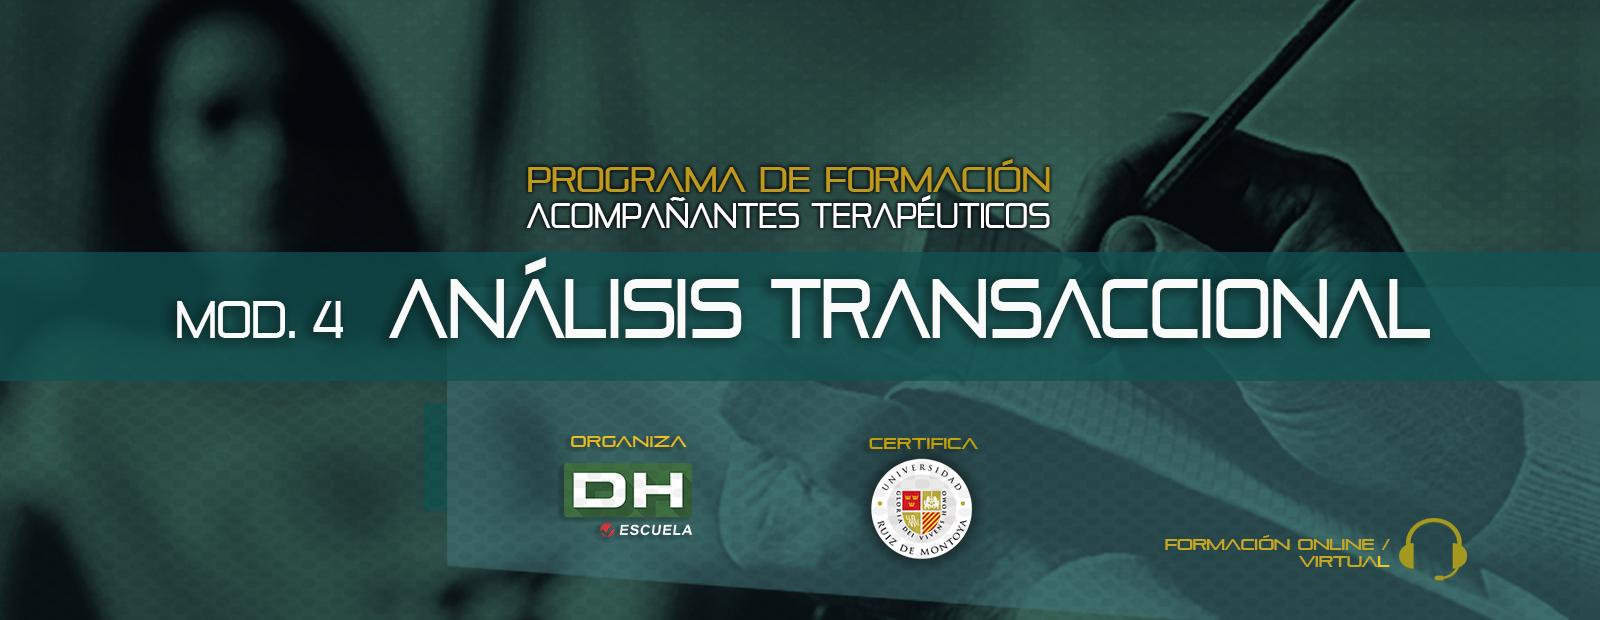 Módulo 04 ANÁLISIS TRANSACCIONAL